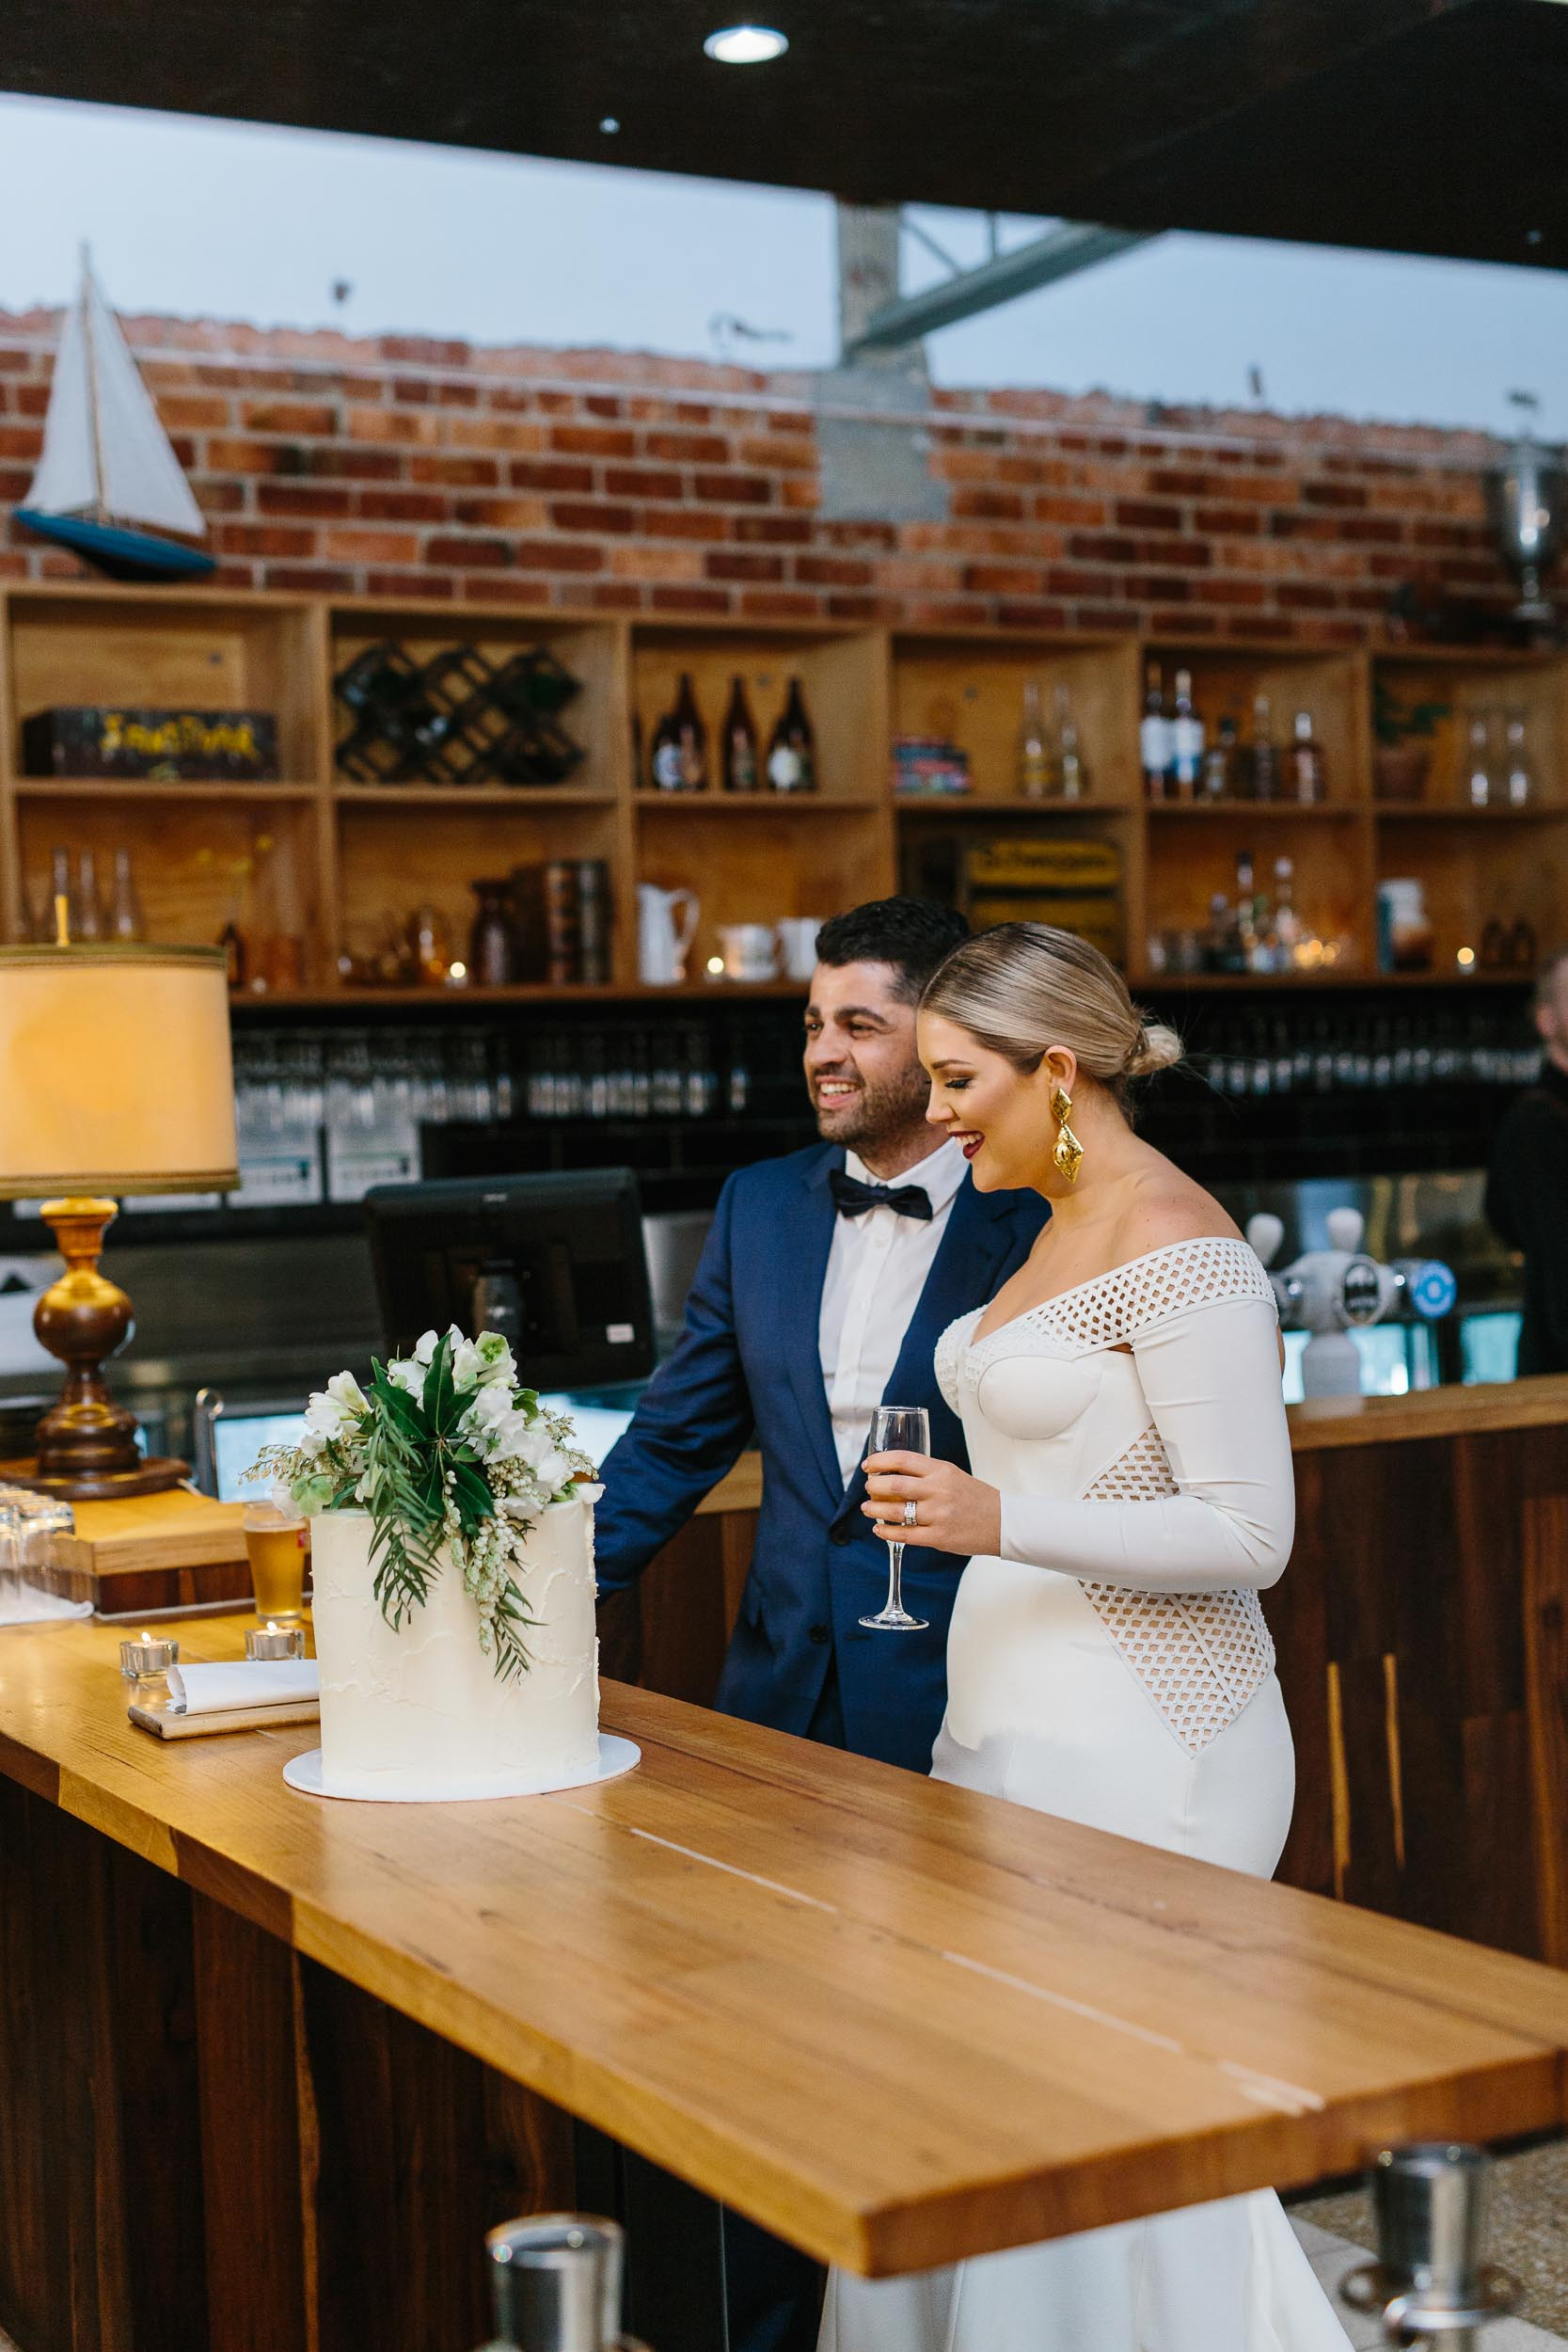 Kas-Richards-Urban-Melbourne-Wedding-Jason-Grech-671.jpg